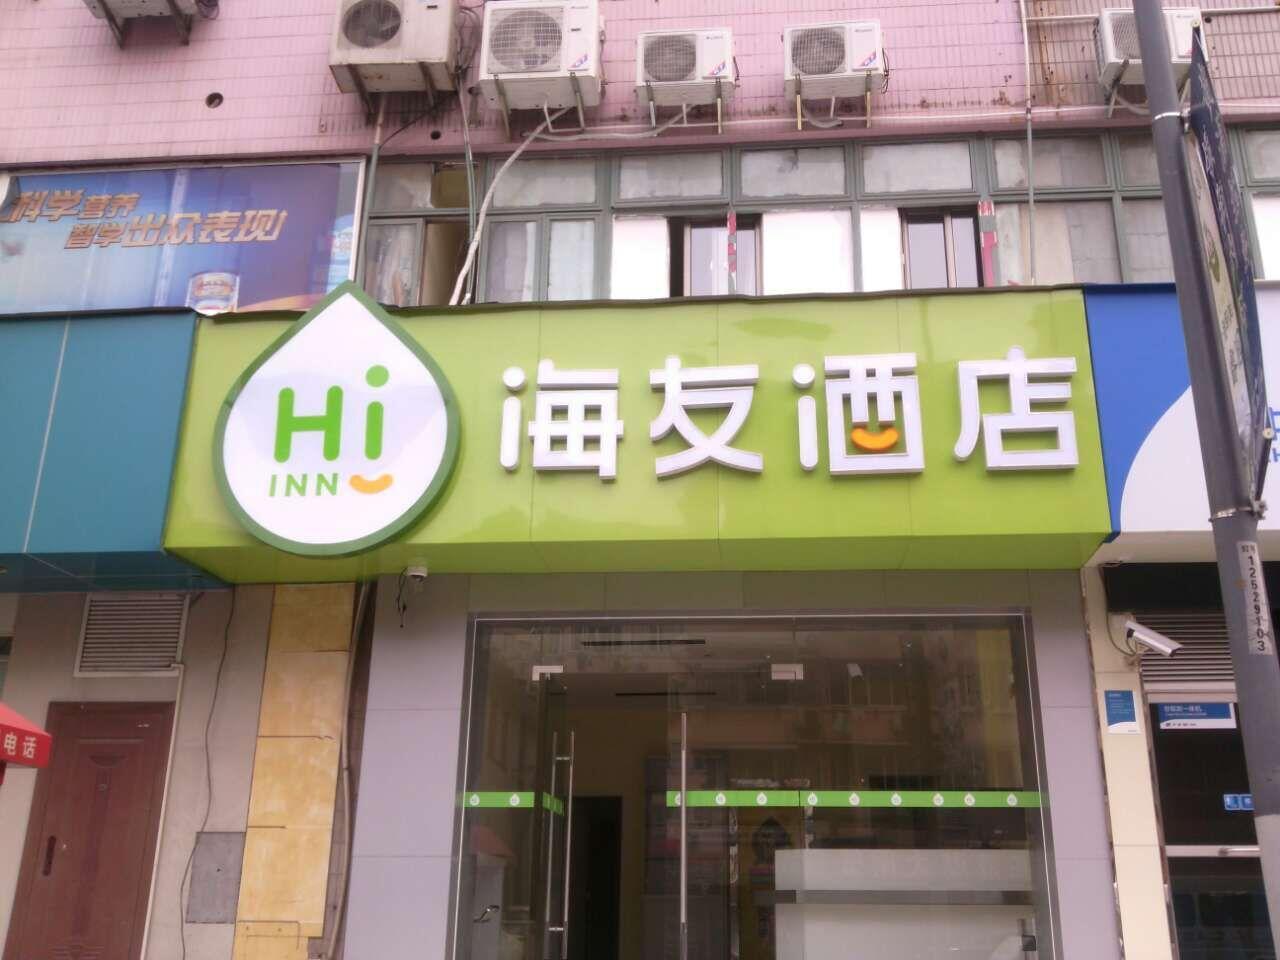 Hi Inn Shanghai Xietudong Road